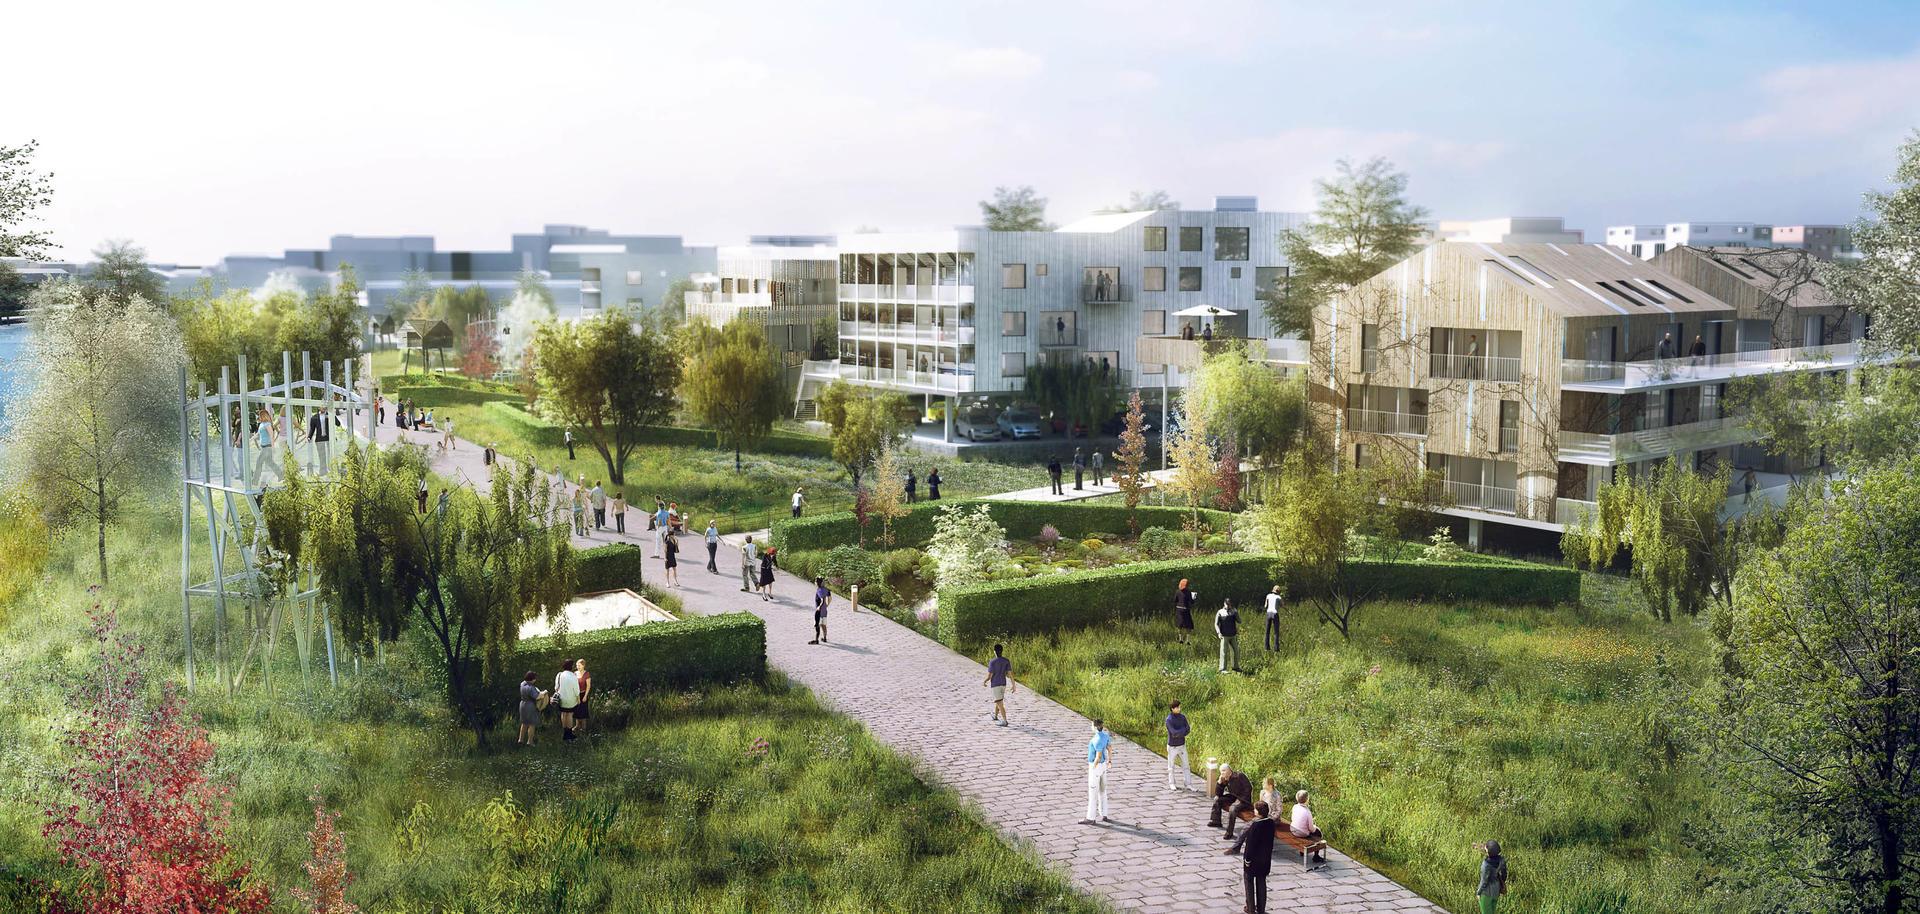 les coquartiers batissons l 39 avenir en ville accompagnement des projets de redynamisation. Black Bedroom Furniture Sets. Home Design Ideas